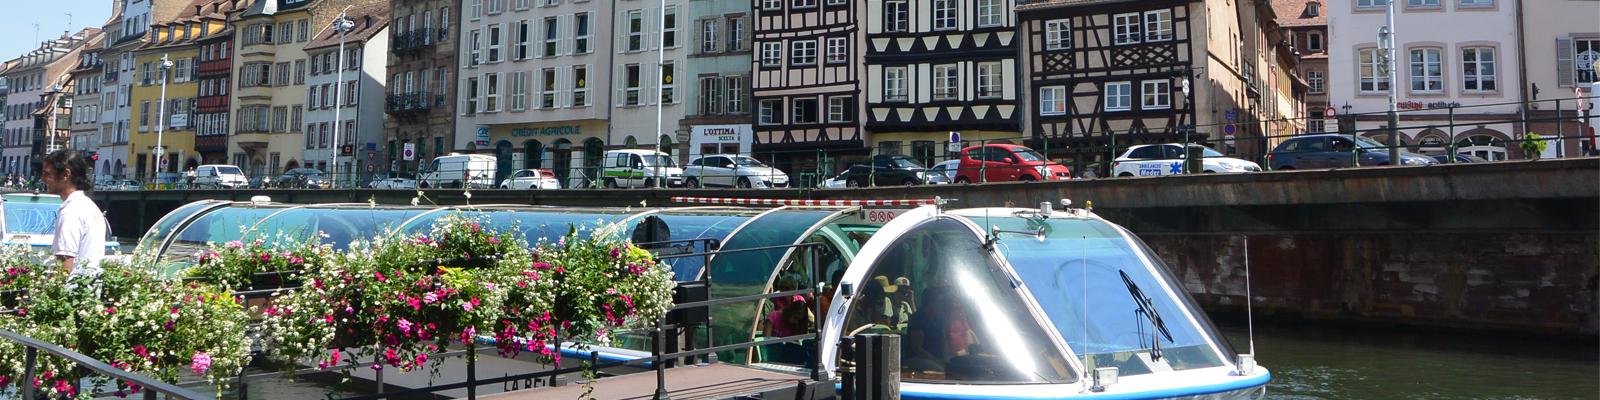 Strasbourg-Feature-Lg.jpg